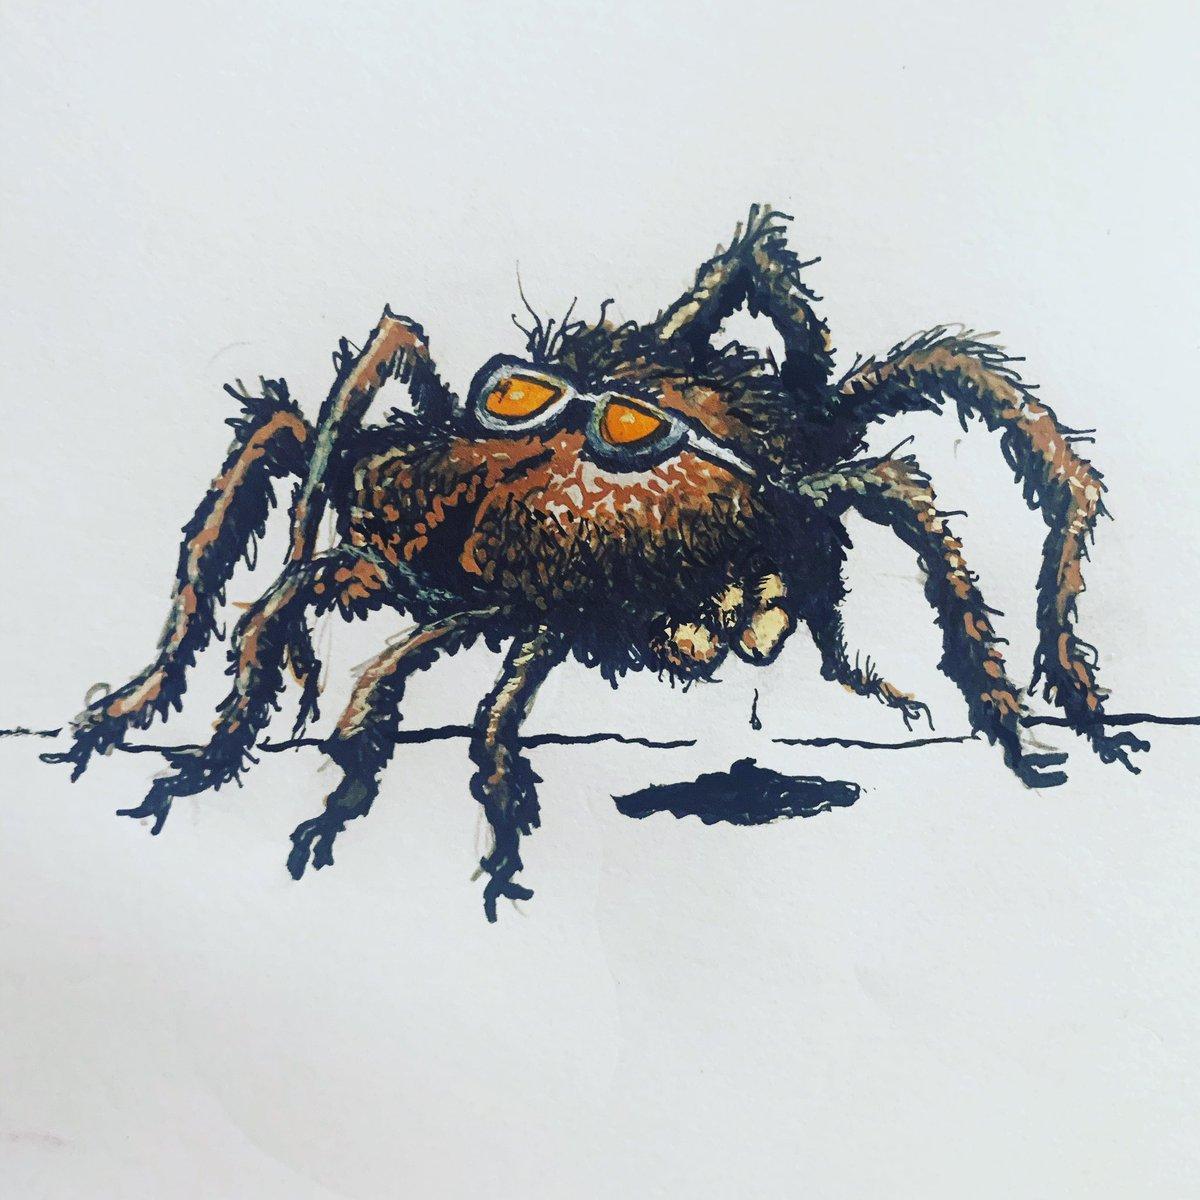 #barkingspider #spider #spiderman #websticky #illustrationart #lowbrow #lowbrowart #slapps #Spanking101 #spiderlurkpic.twitter.com/HU2SRyLWPG